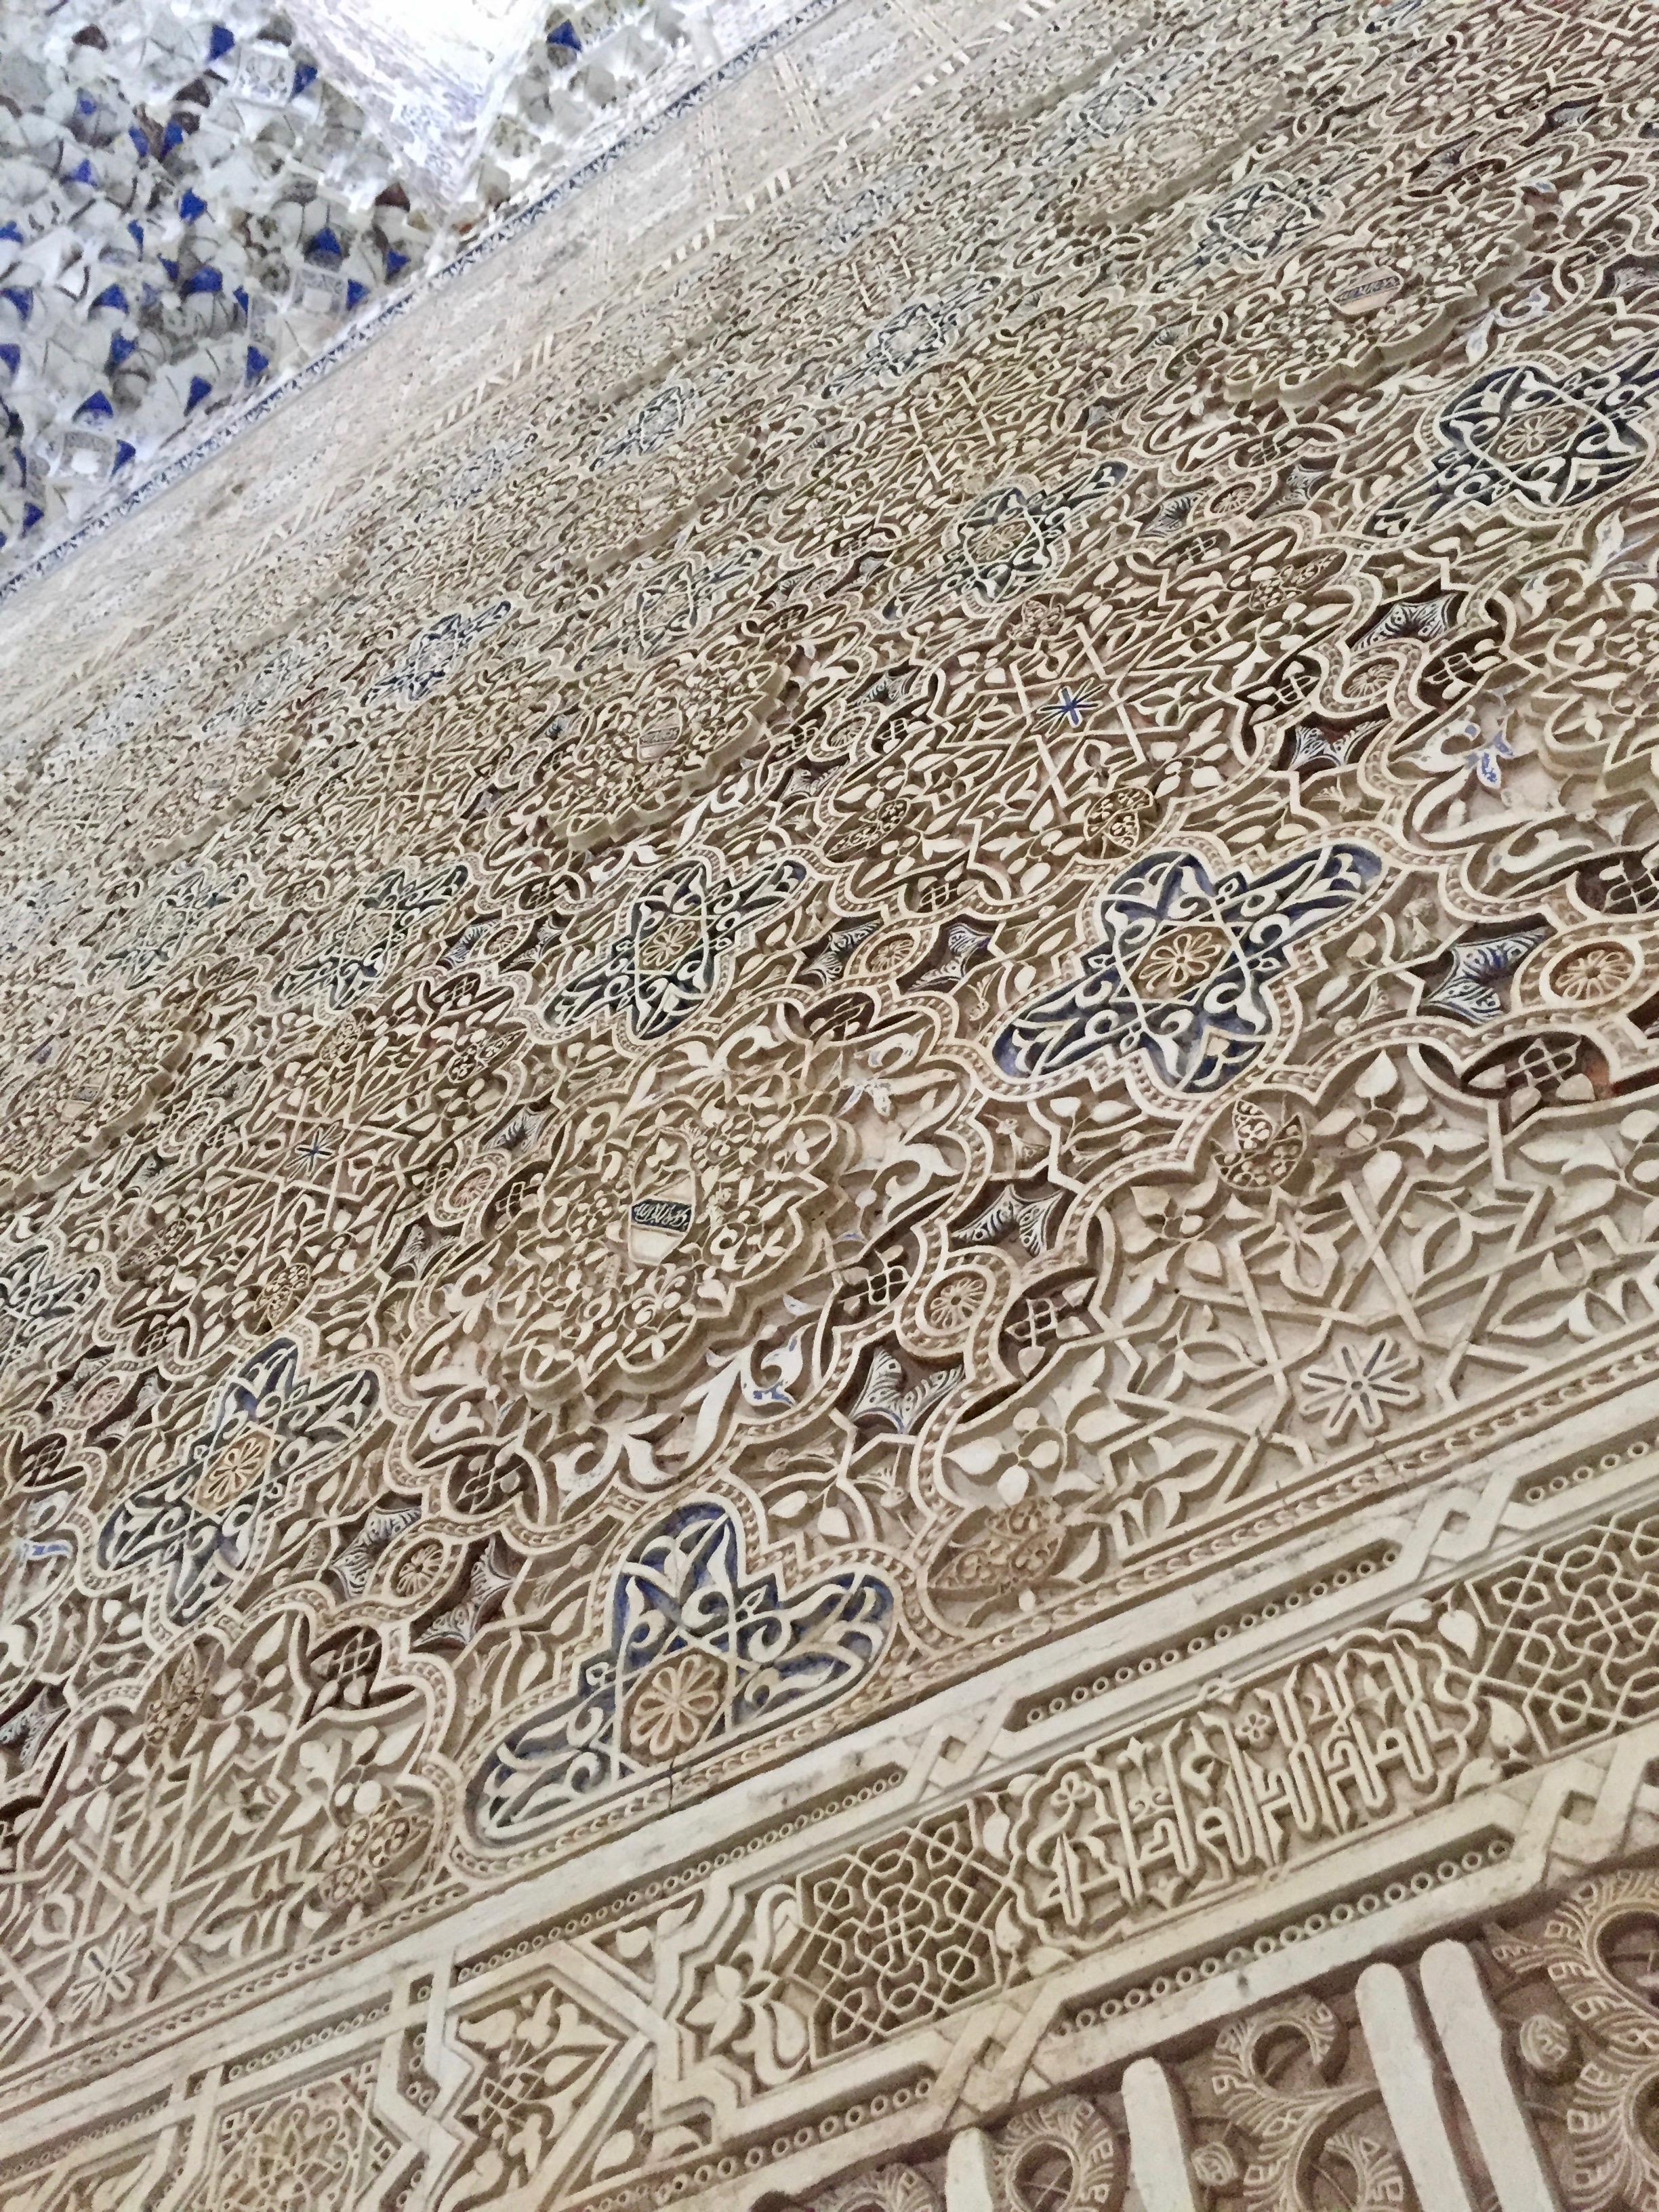 Alhambra, Granada 2